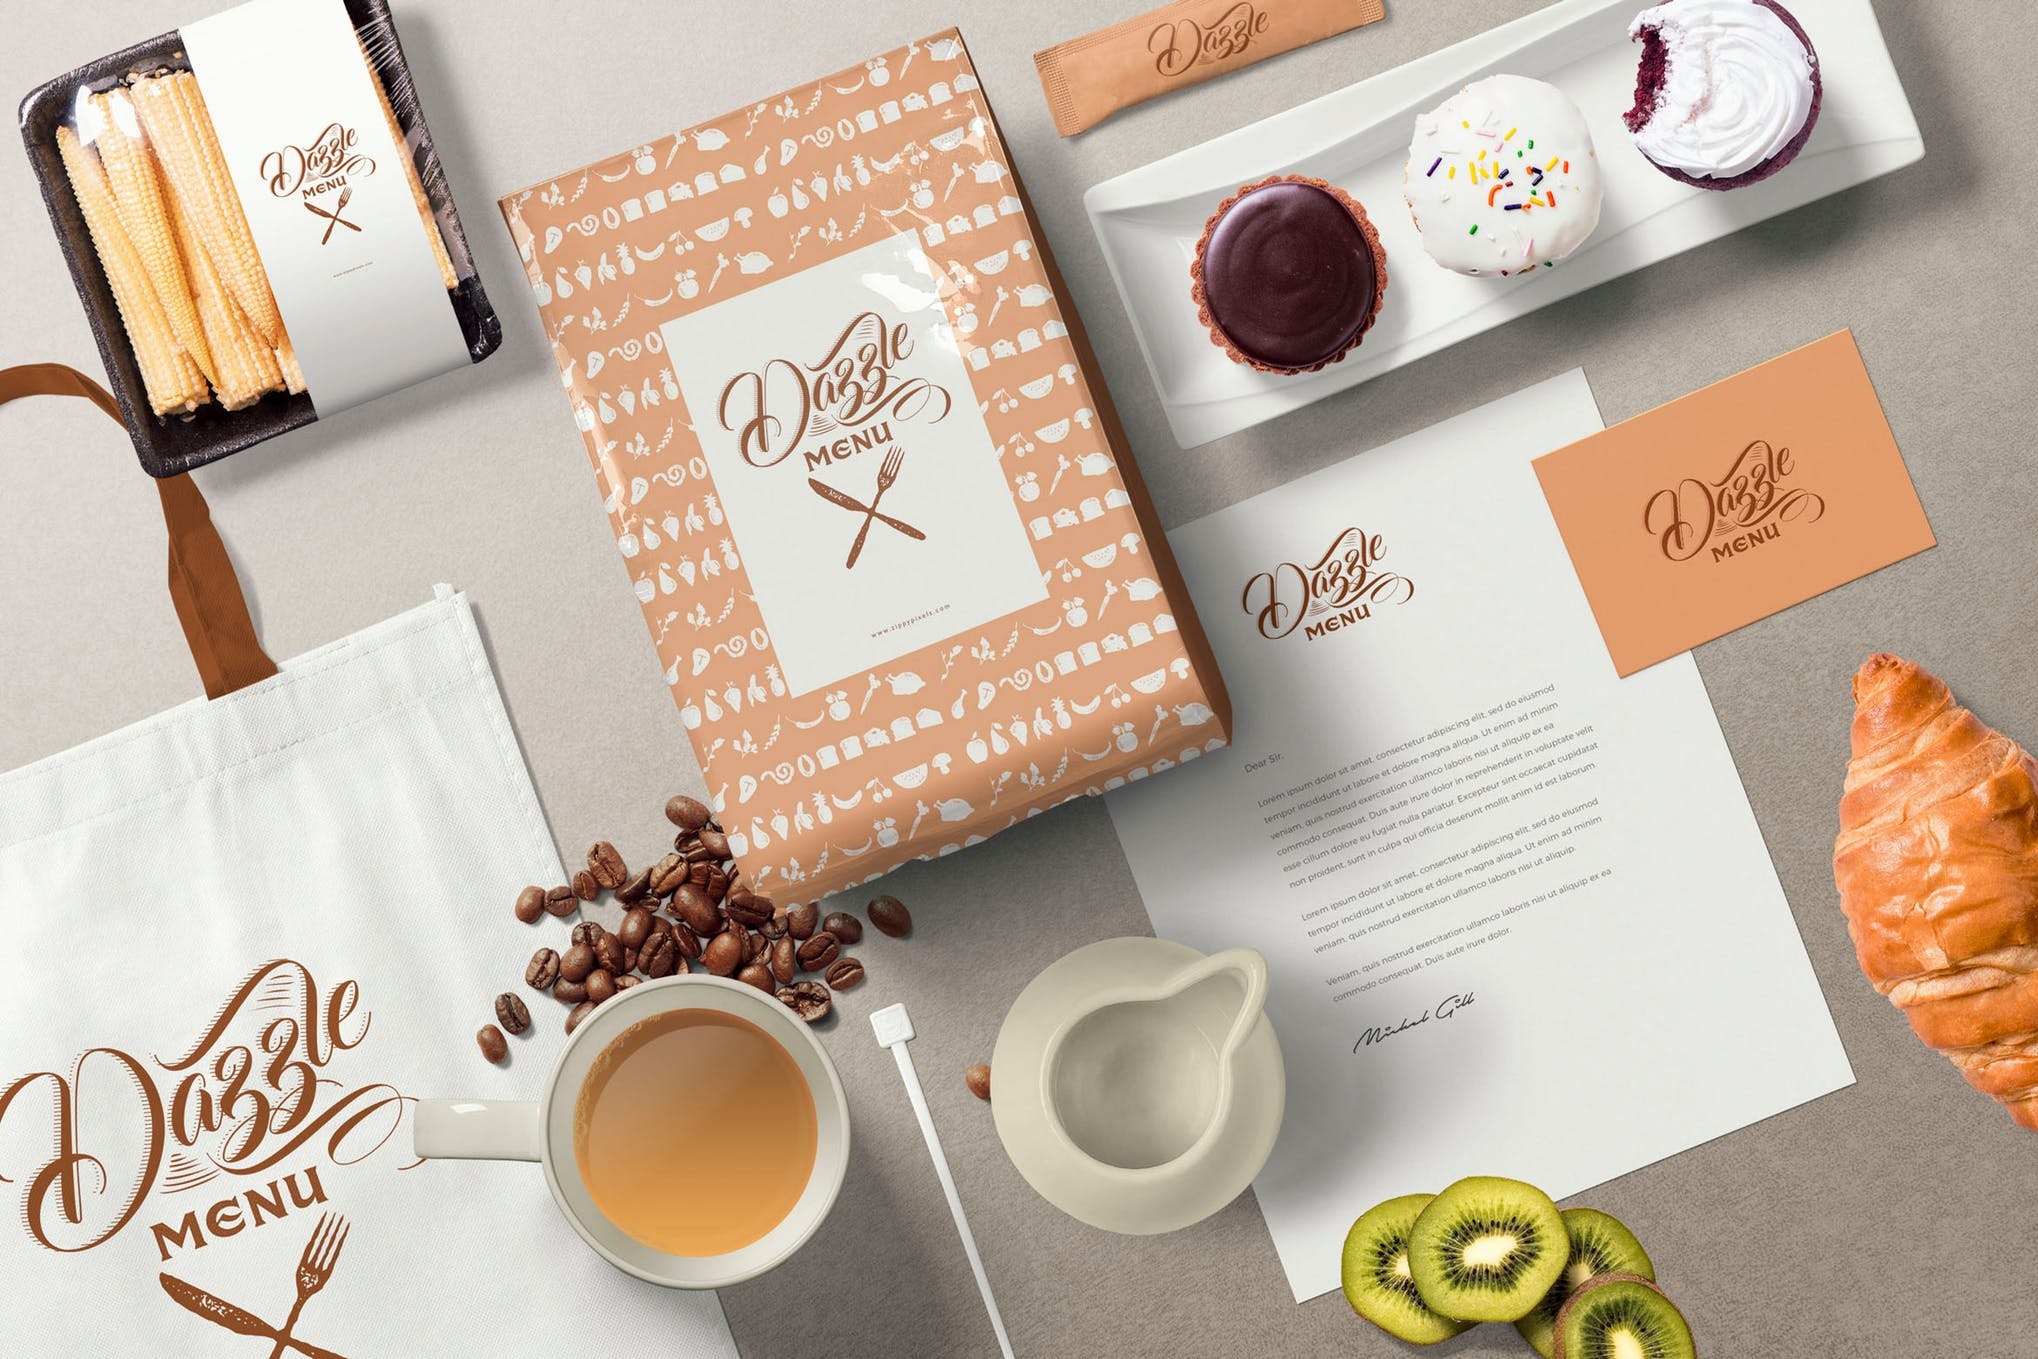 咖啡品牌样机素材模板展示下载Coffee Themed Brand Identity Mockup Scenes –